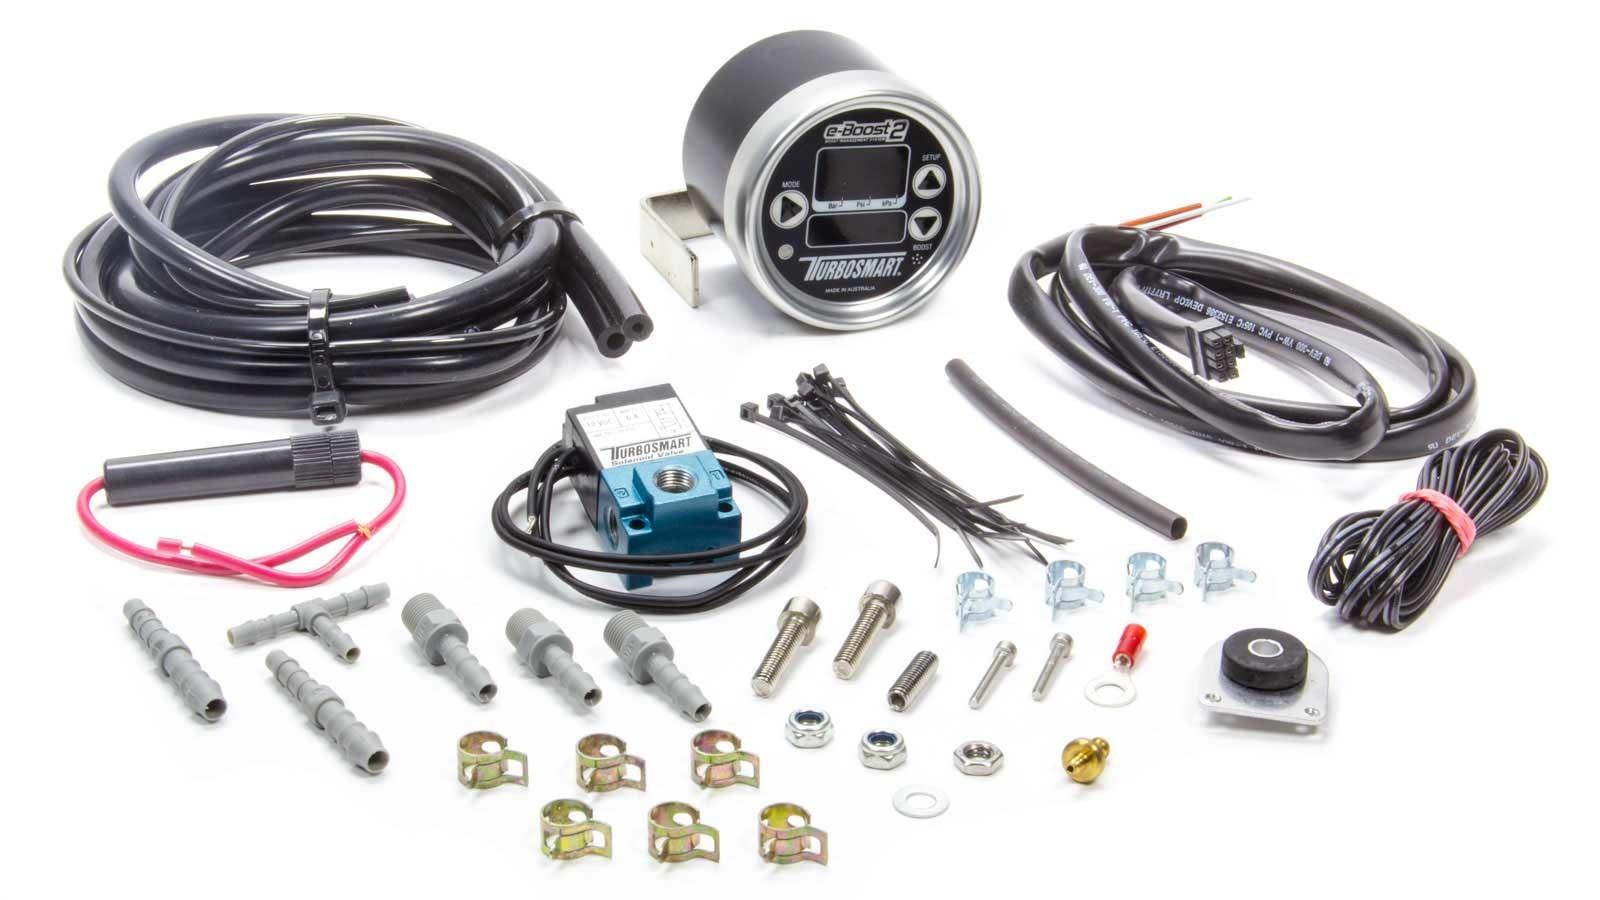 Turbosmart Usa eB2 Elec Boost Control Gauge 60psi Black/Silver